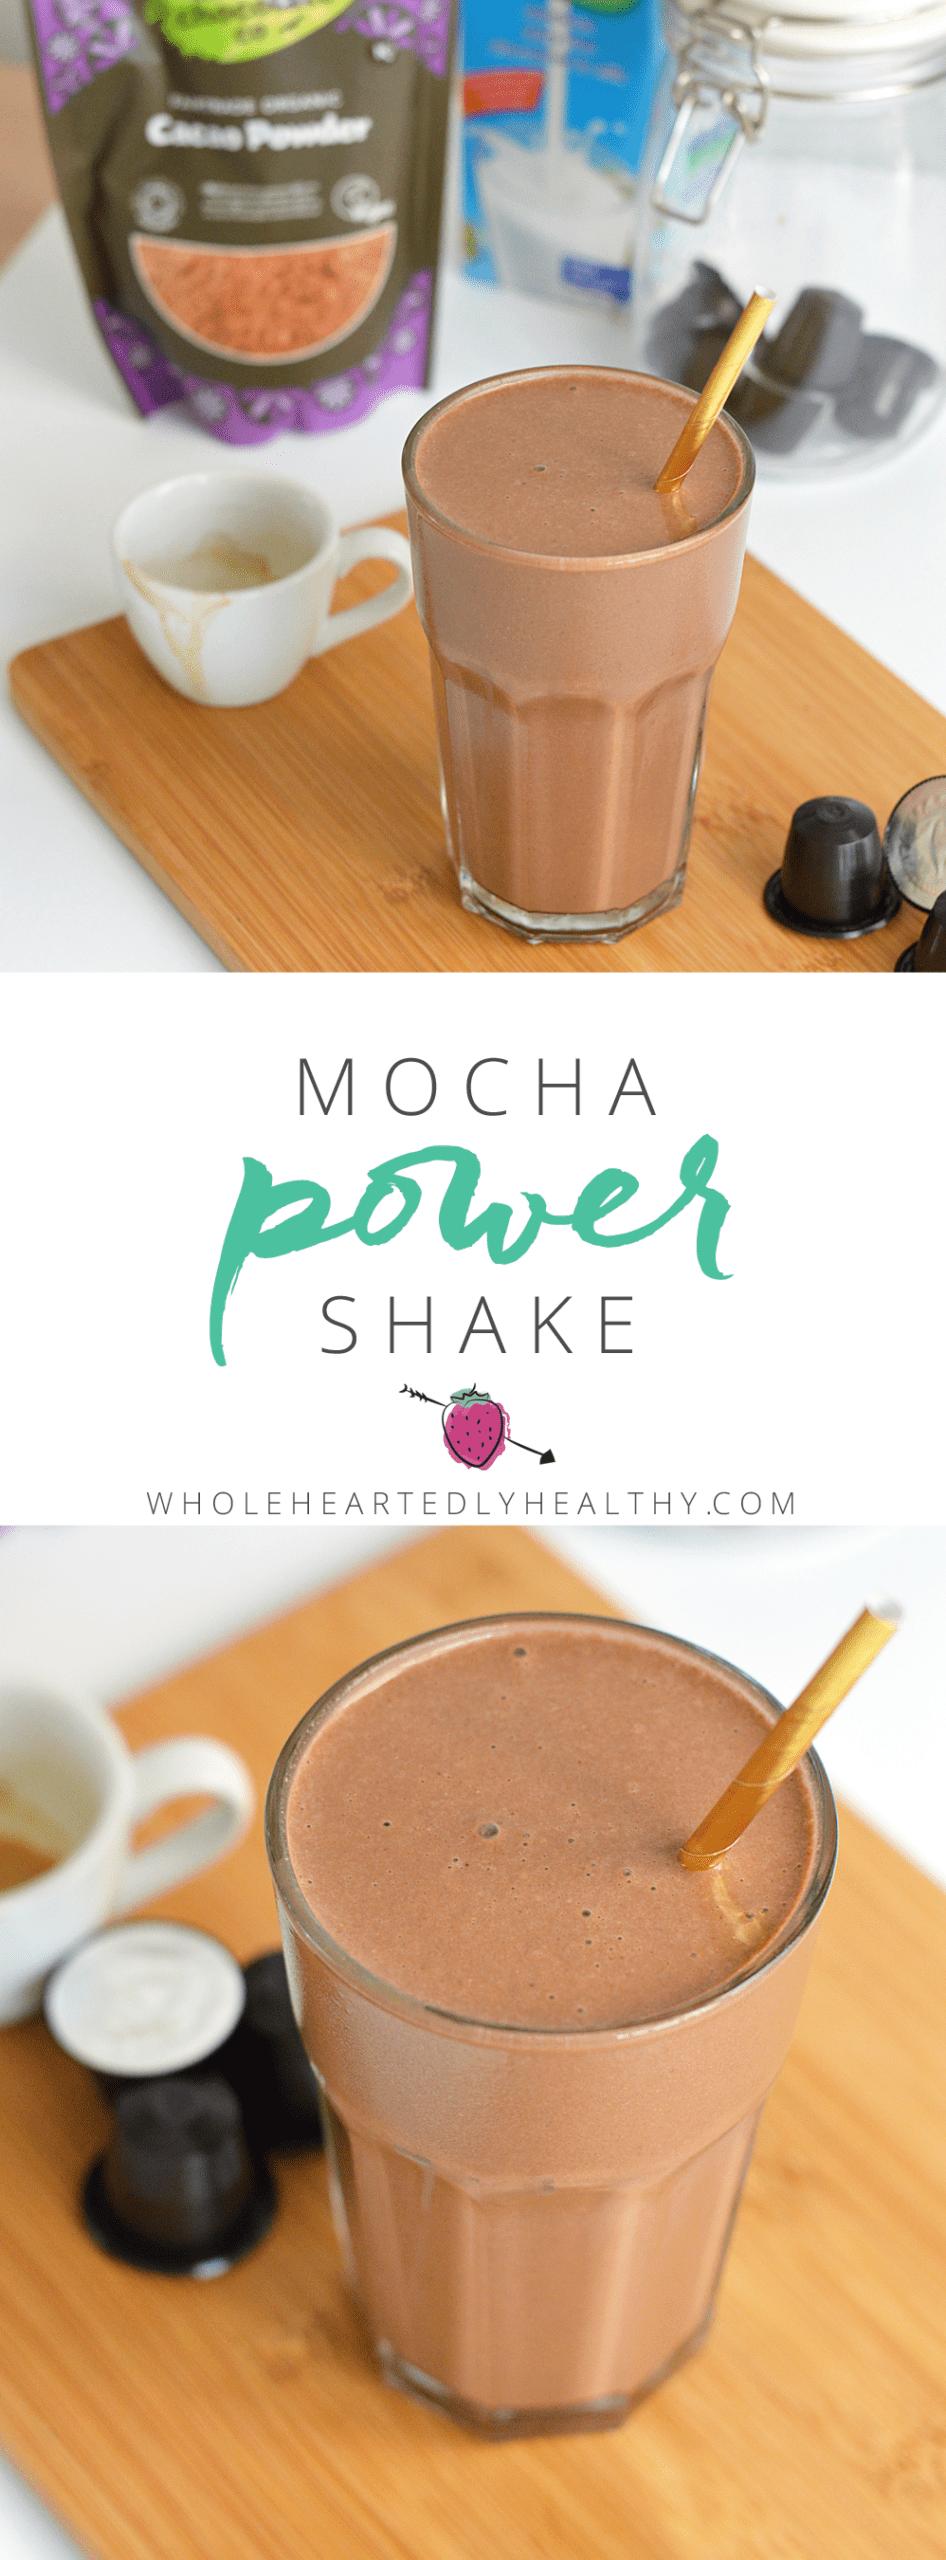 Mocha power shake